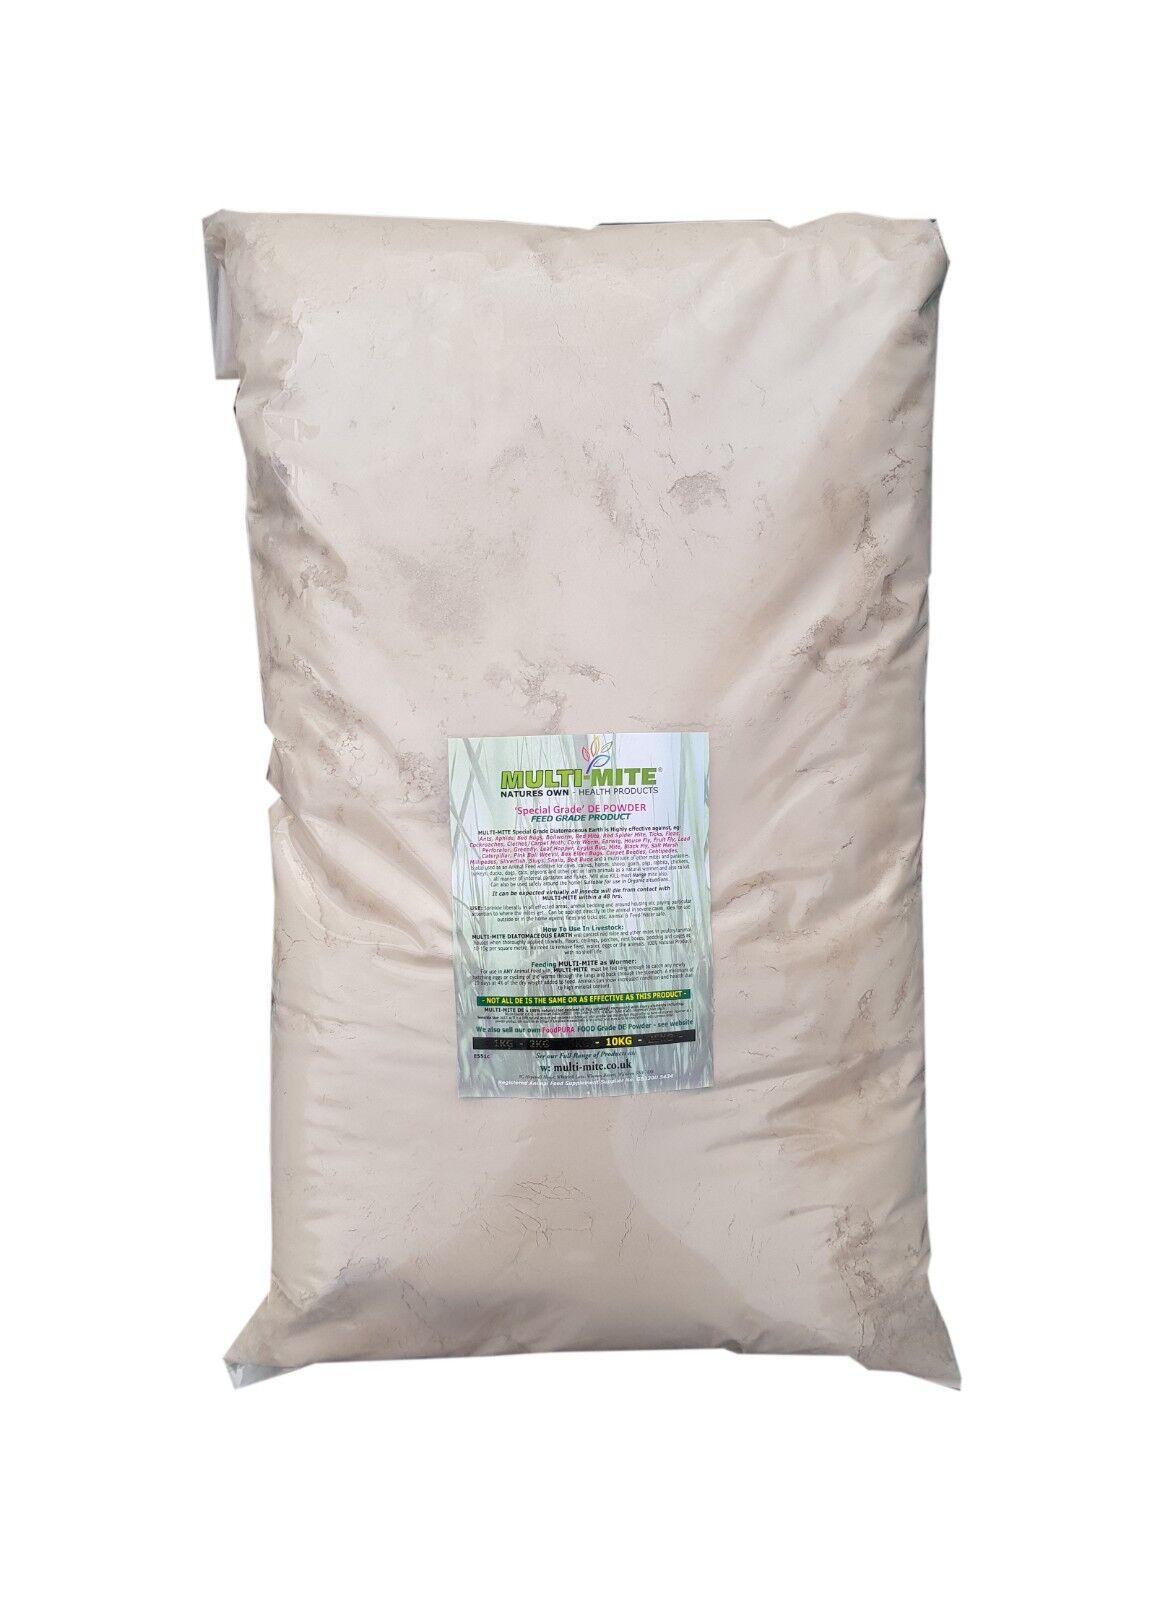 Multi Mite Diatomaceous Earth 10kg De Red Mite Worm Powder Feed Supplement Grade 7426799806525 Ebay